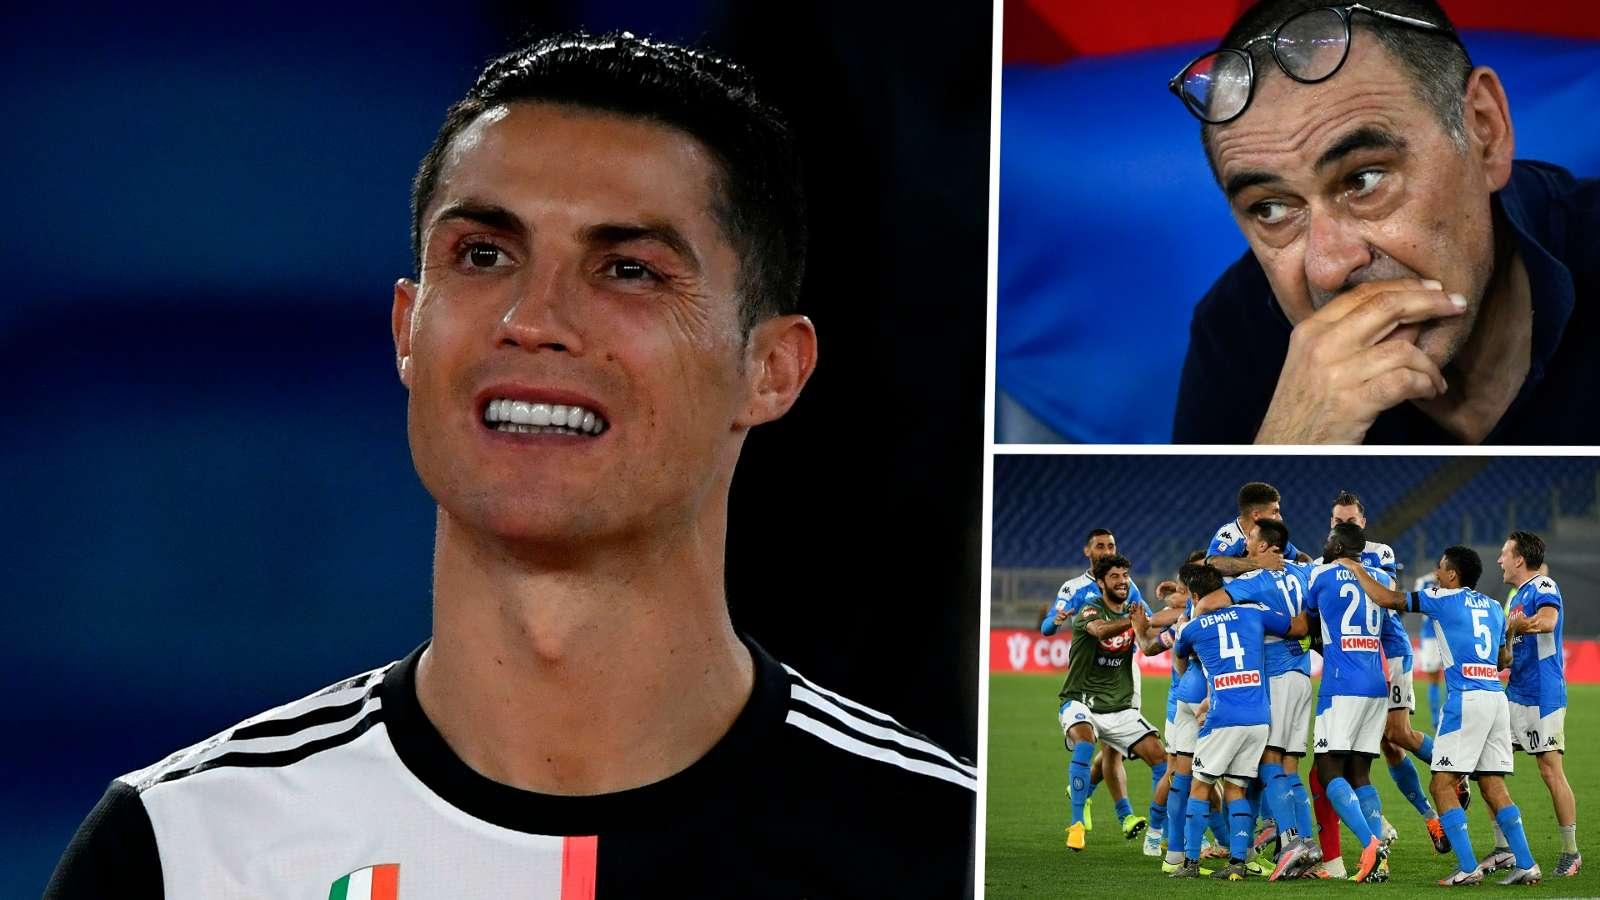 Cristiaon Ronaldo Maurizio Sarri Juventus Coppa Italia 2019-20 GFX